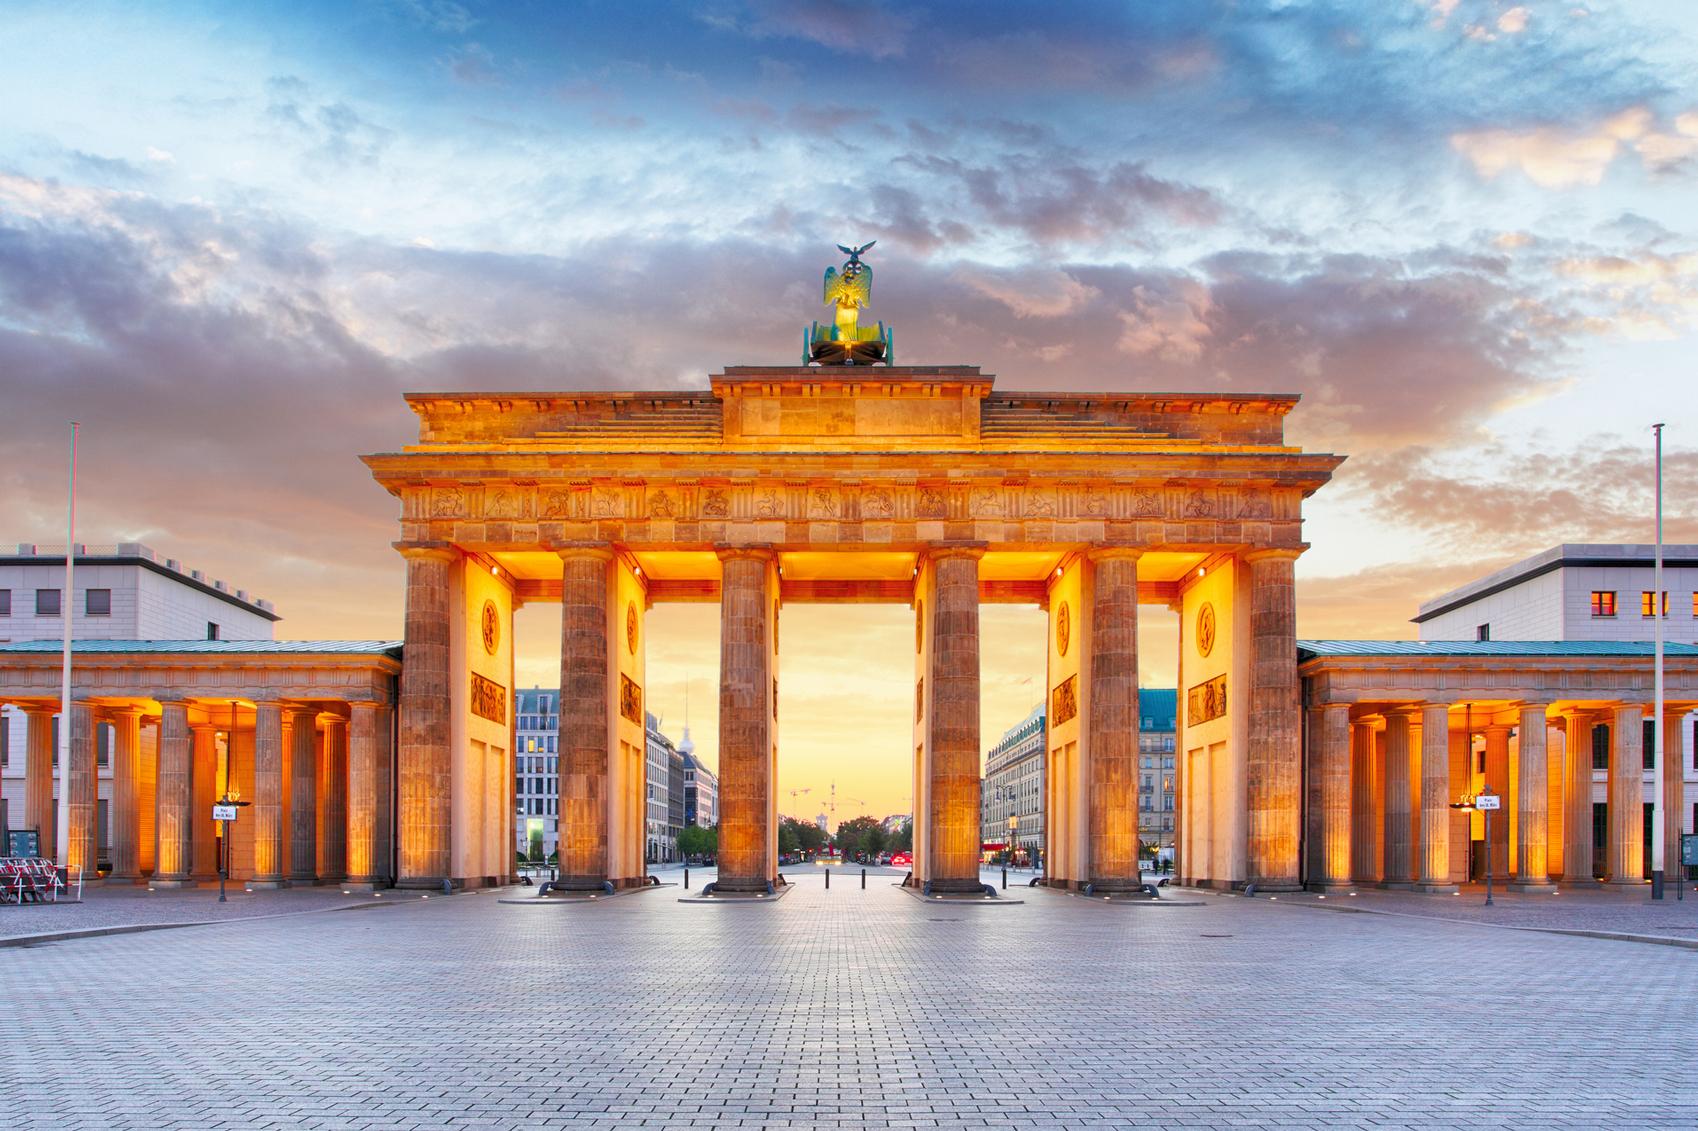 European Cities to Visit Berlin-www.istockphoto.com_gb_photo_berlin-brandenburg-gate-at-night-gm494161874-77297715-TomasSereda